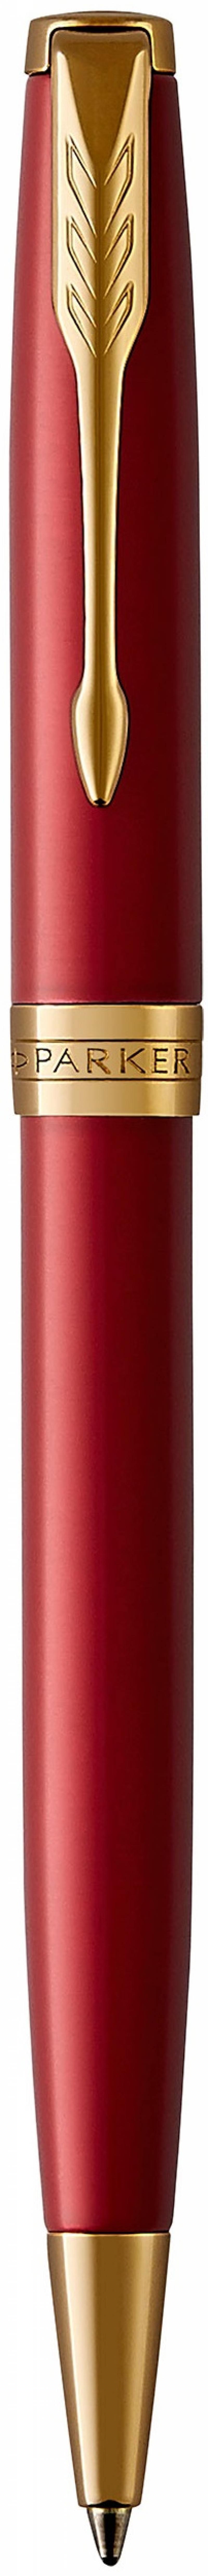 Шариковая ручка поворотная Parker Sonnet Core K539 LaqRed GT черный M 1931476 шариковая ручка поворотная parker sonnet core k527 stainless steel gt черный m 1931507